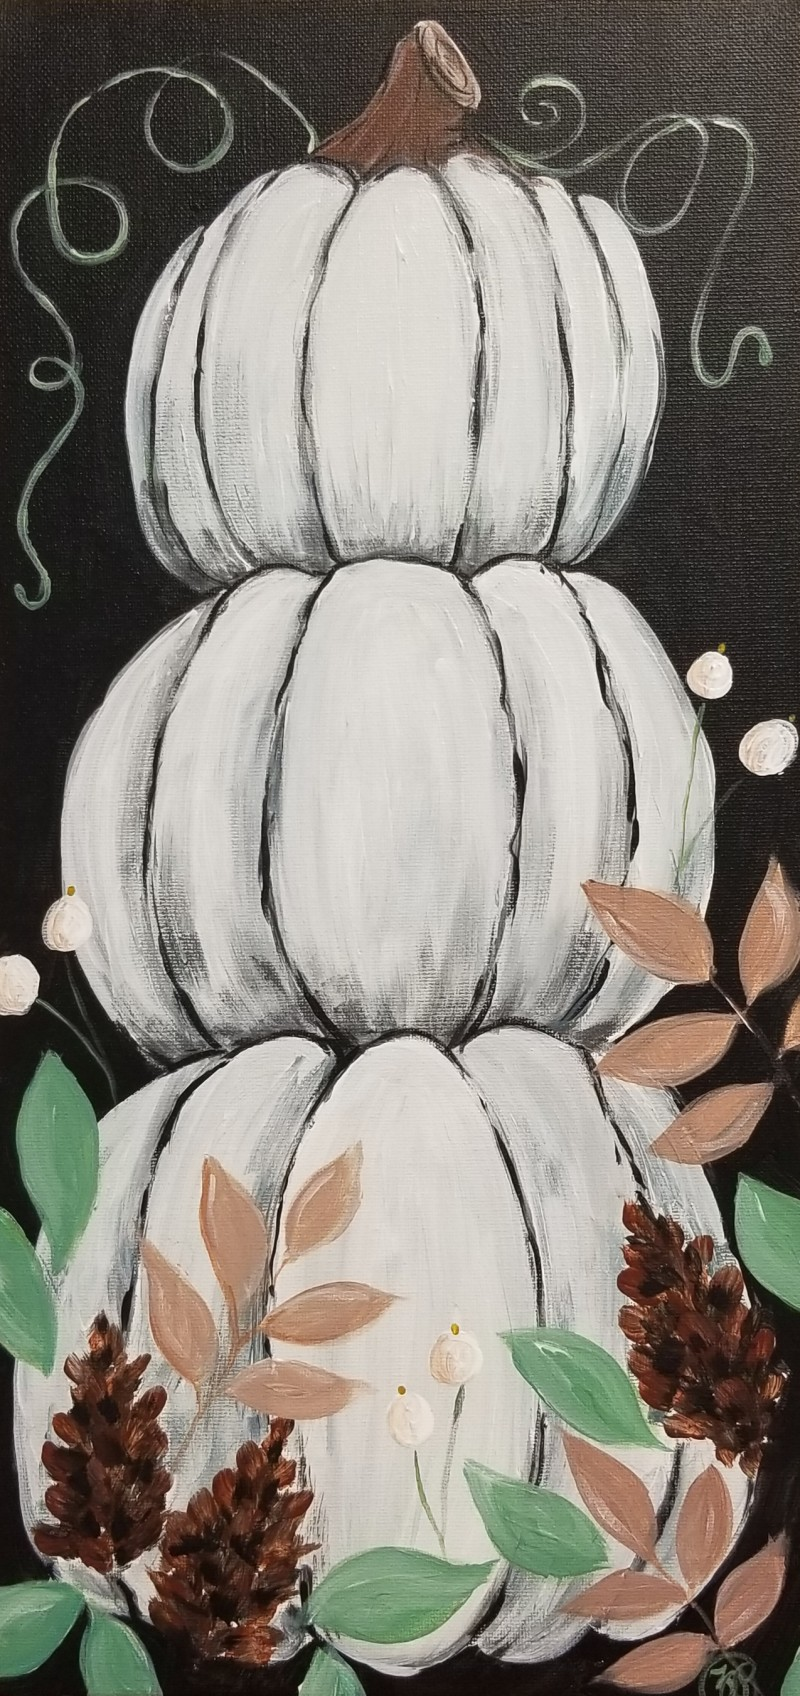 3 PM In Studio | Stacked Pumpkins